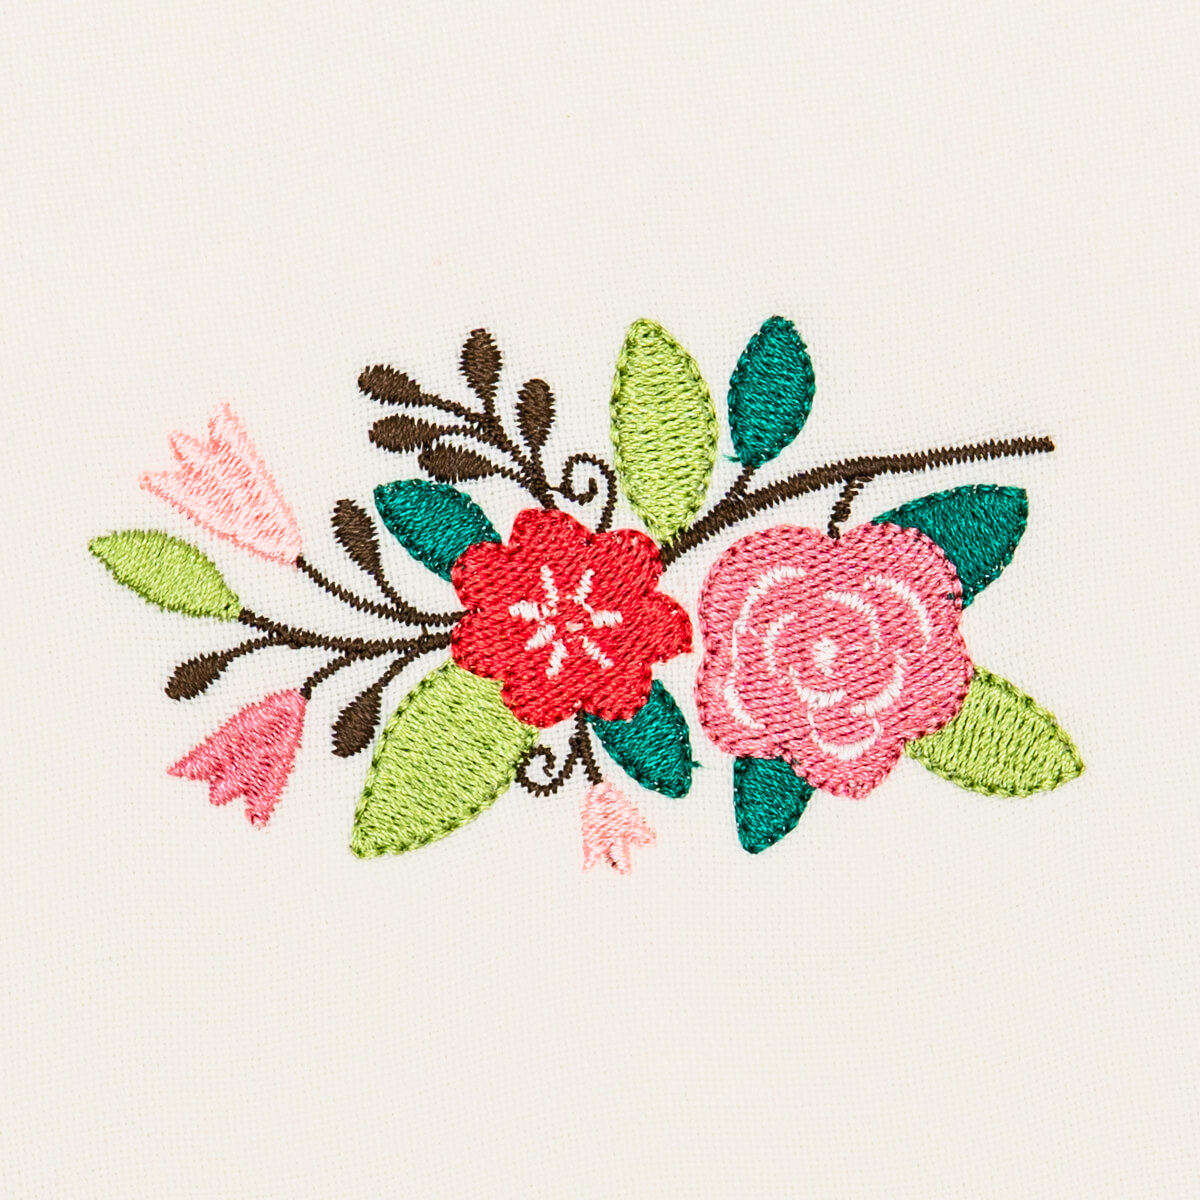 Matriz de bordado floral 512